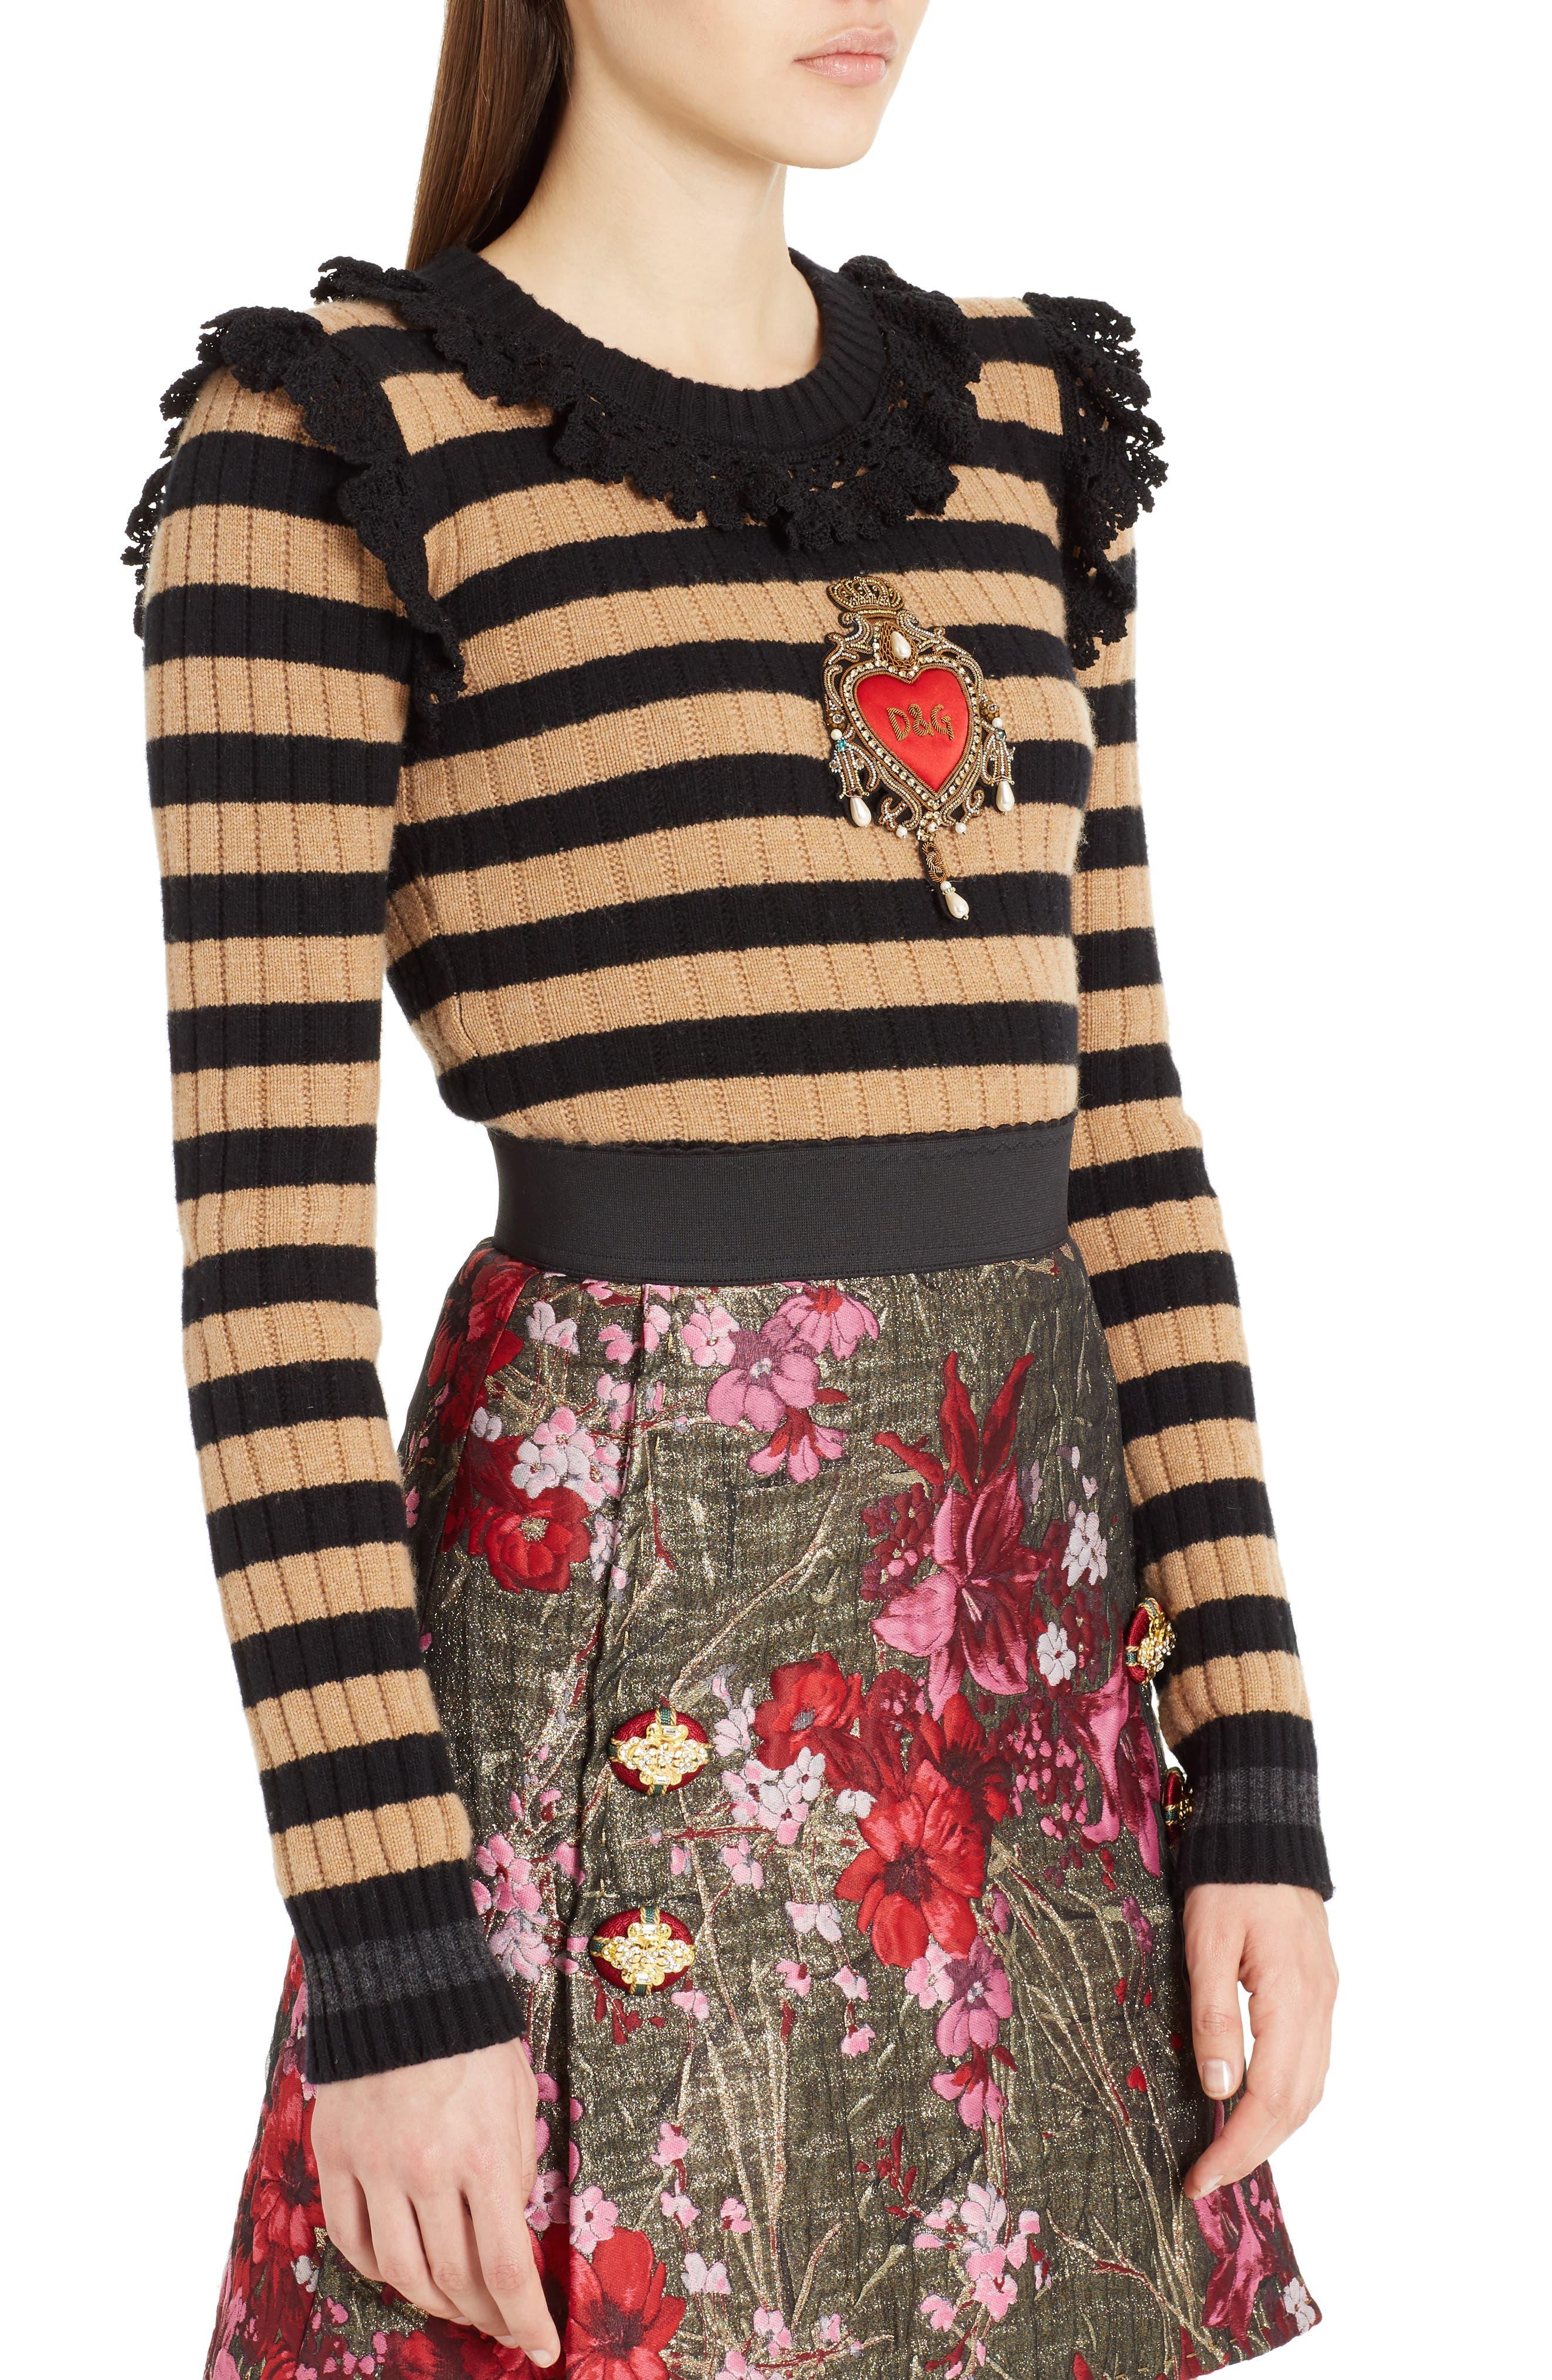 Heart Patch Stripe Wool & Cashmere Sweater,                             Alternate thumbnail 4, color,                             Camel/ Black Stripe